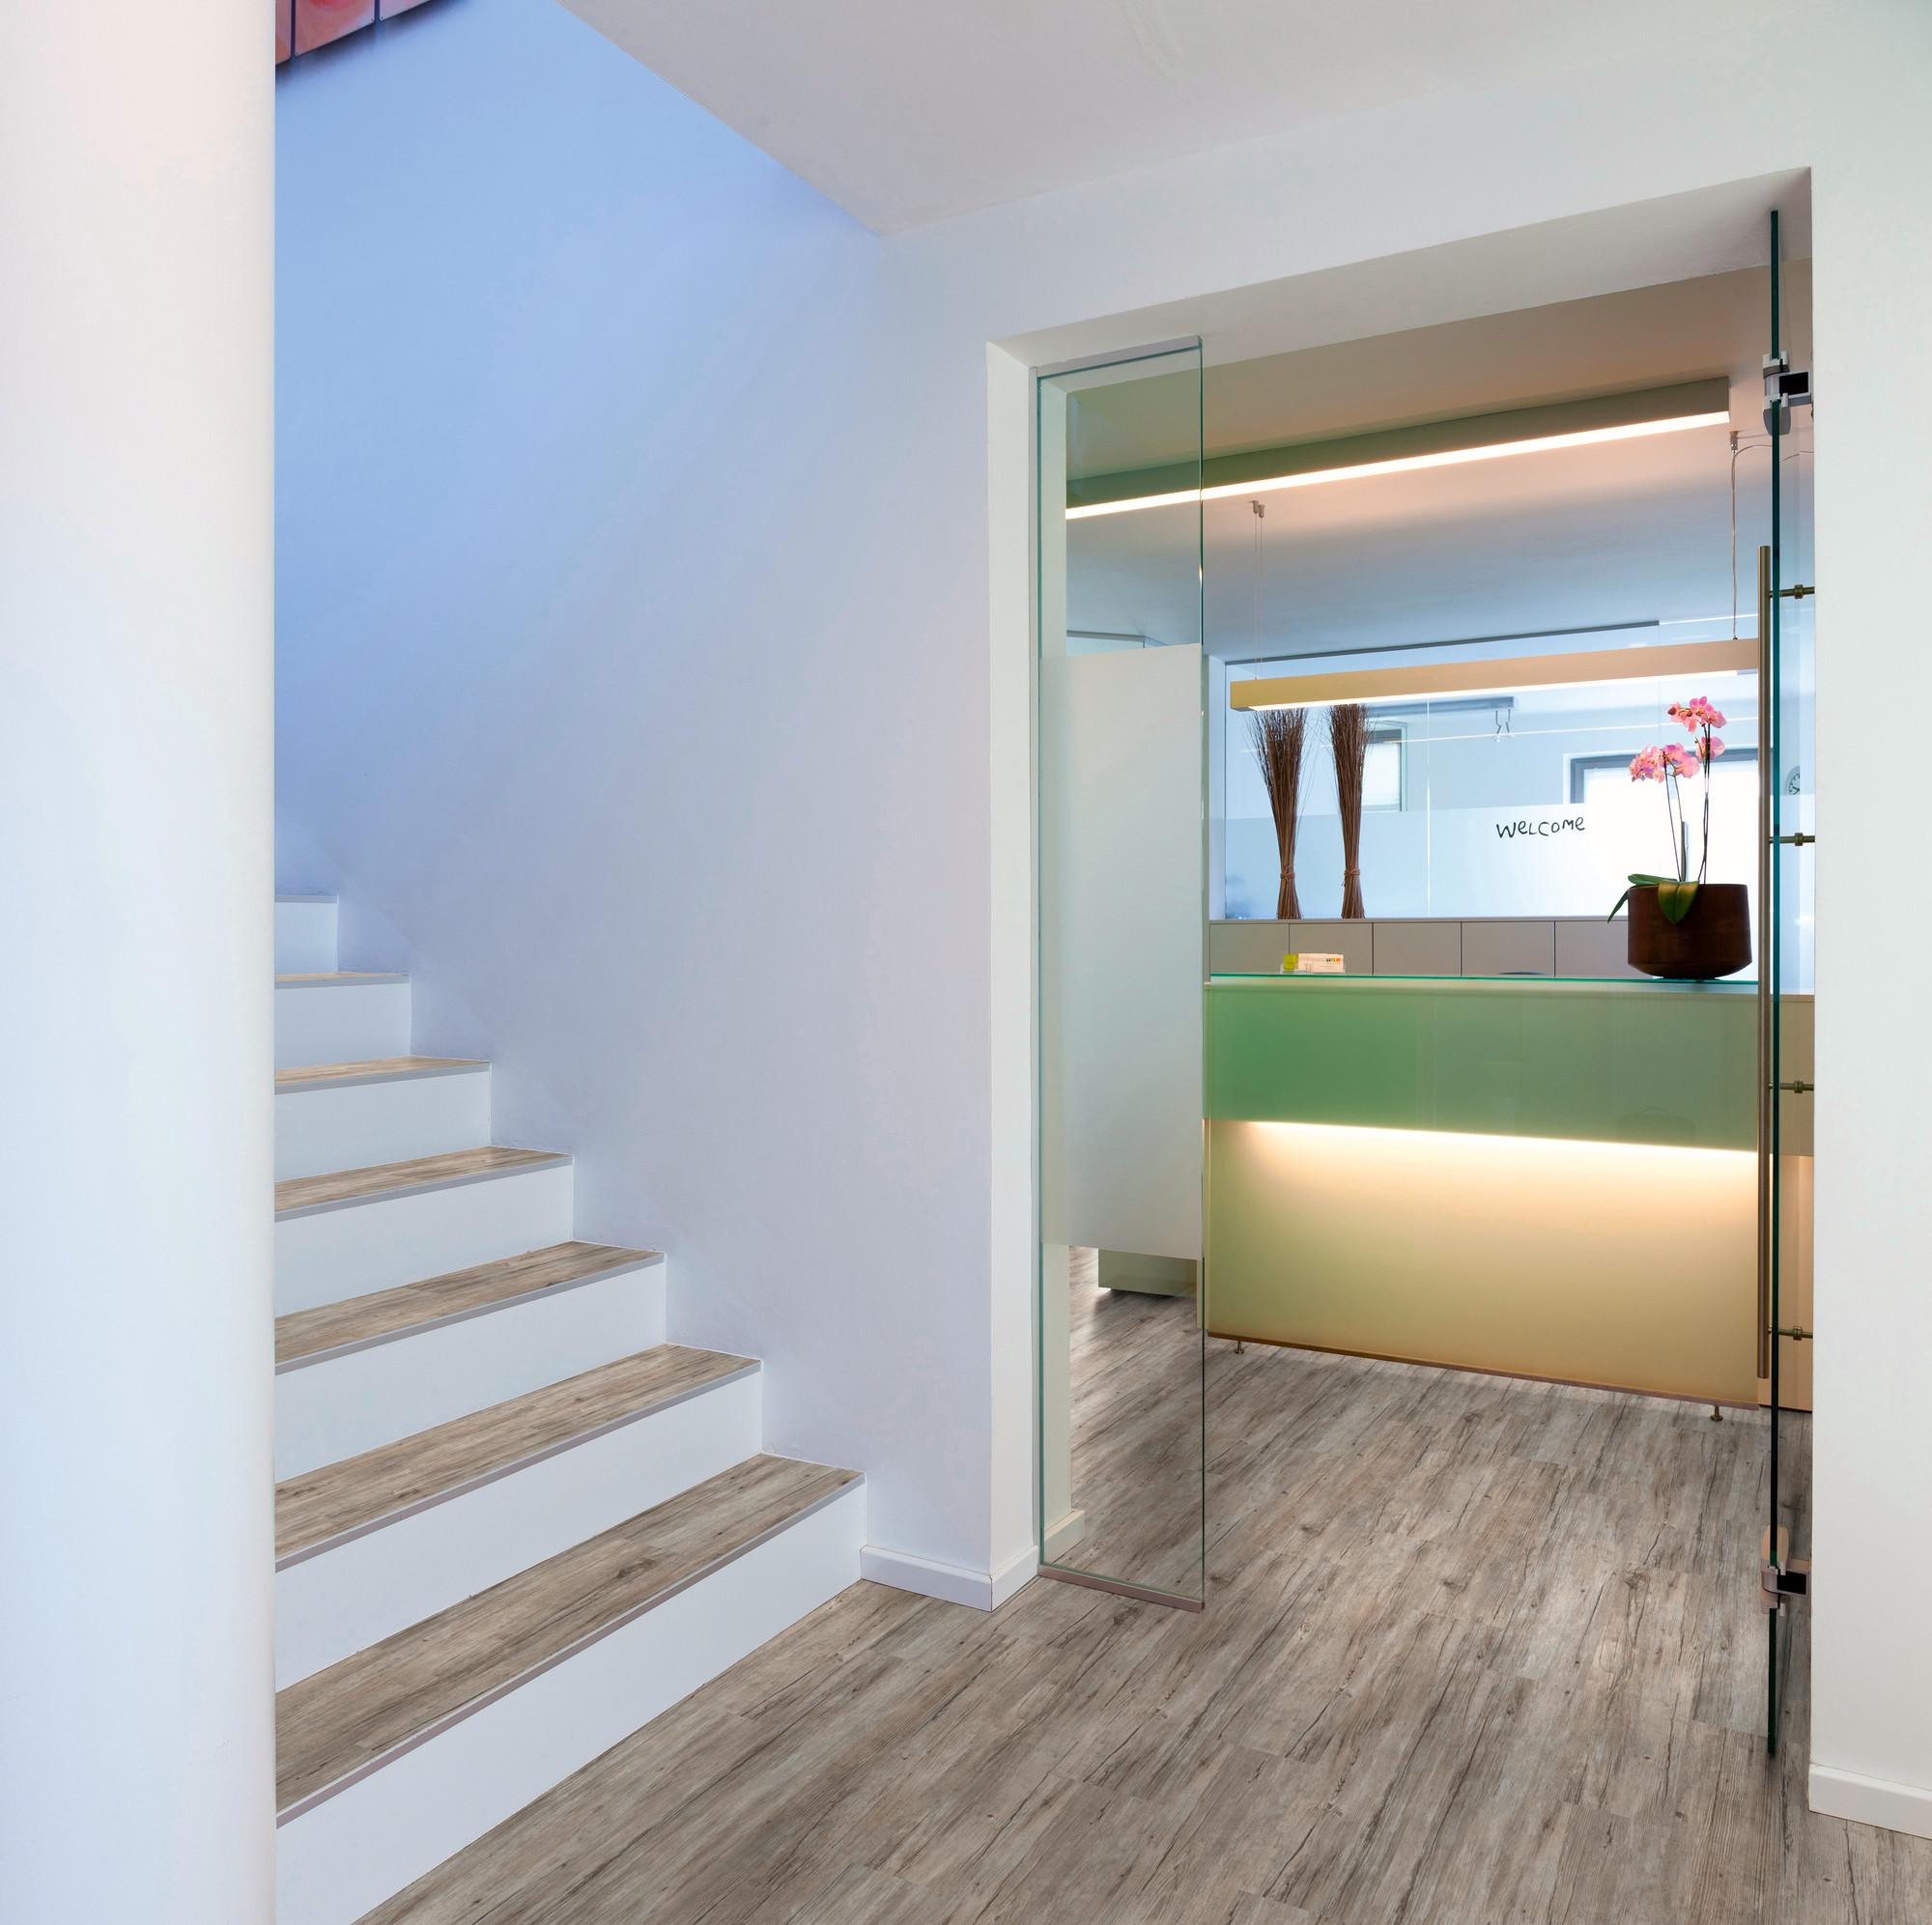 Designboden - Contract 0,55 Planke kleben 1